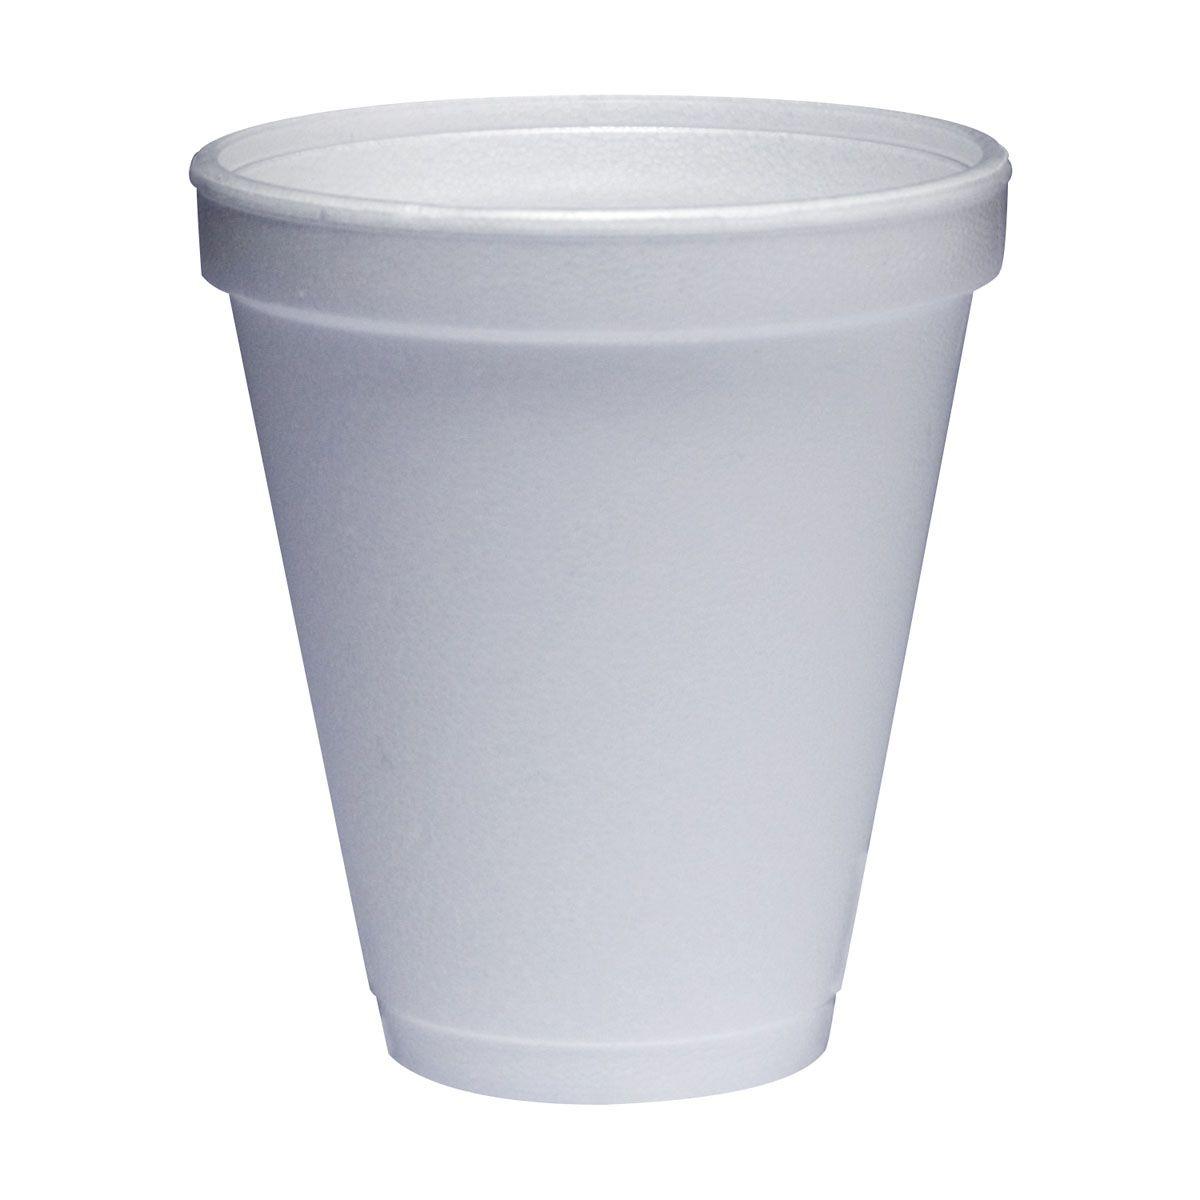 dart-styrofoam-cups-styrofoam-cups-12-oz-qty-of-1000-model-dcc-12j12.jpg